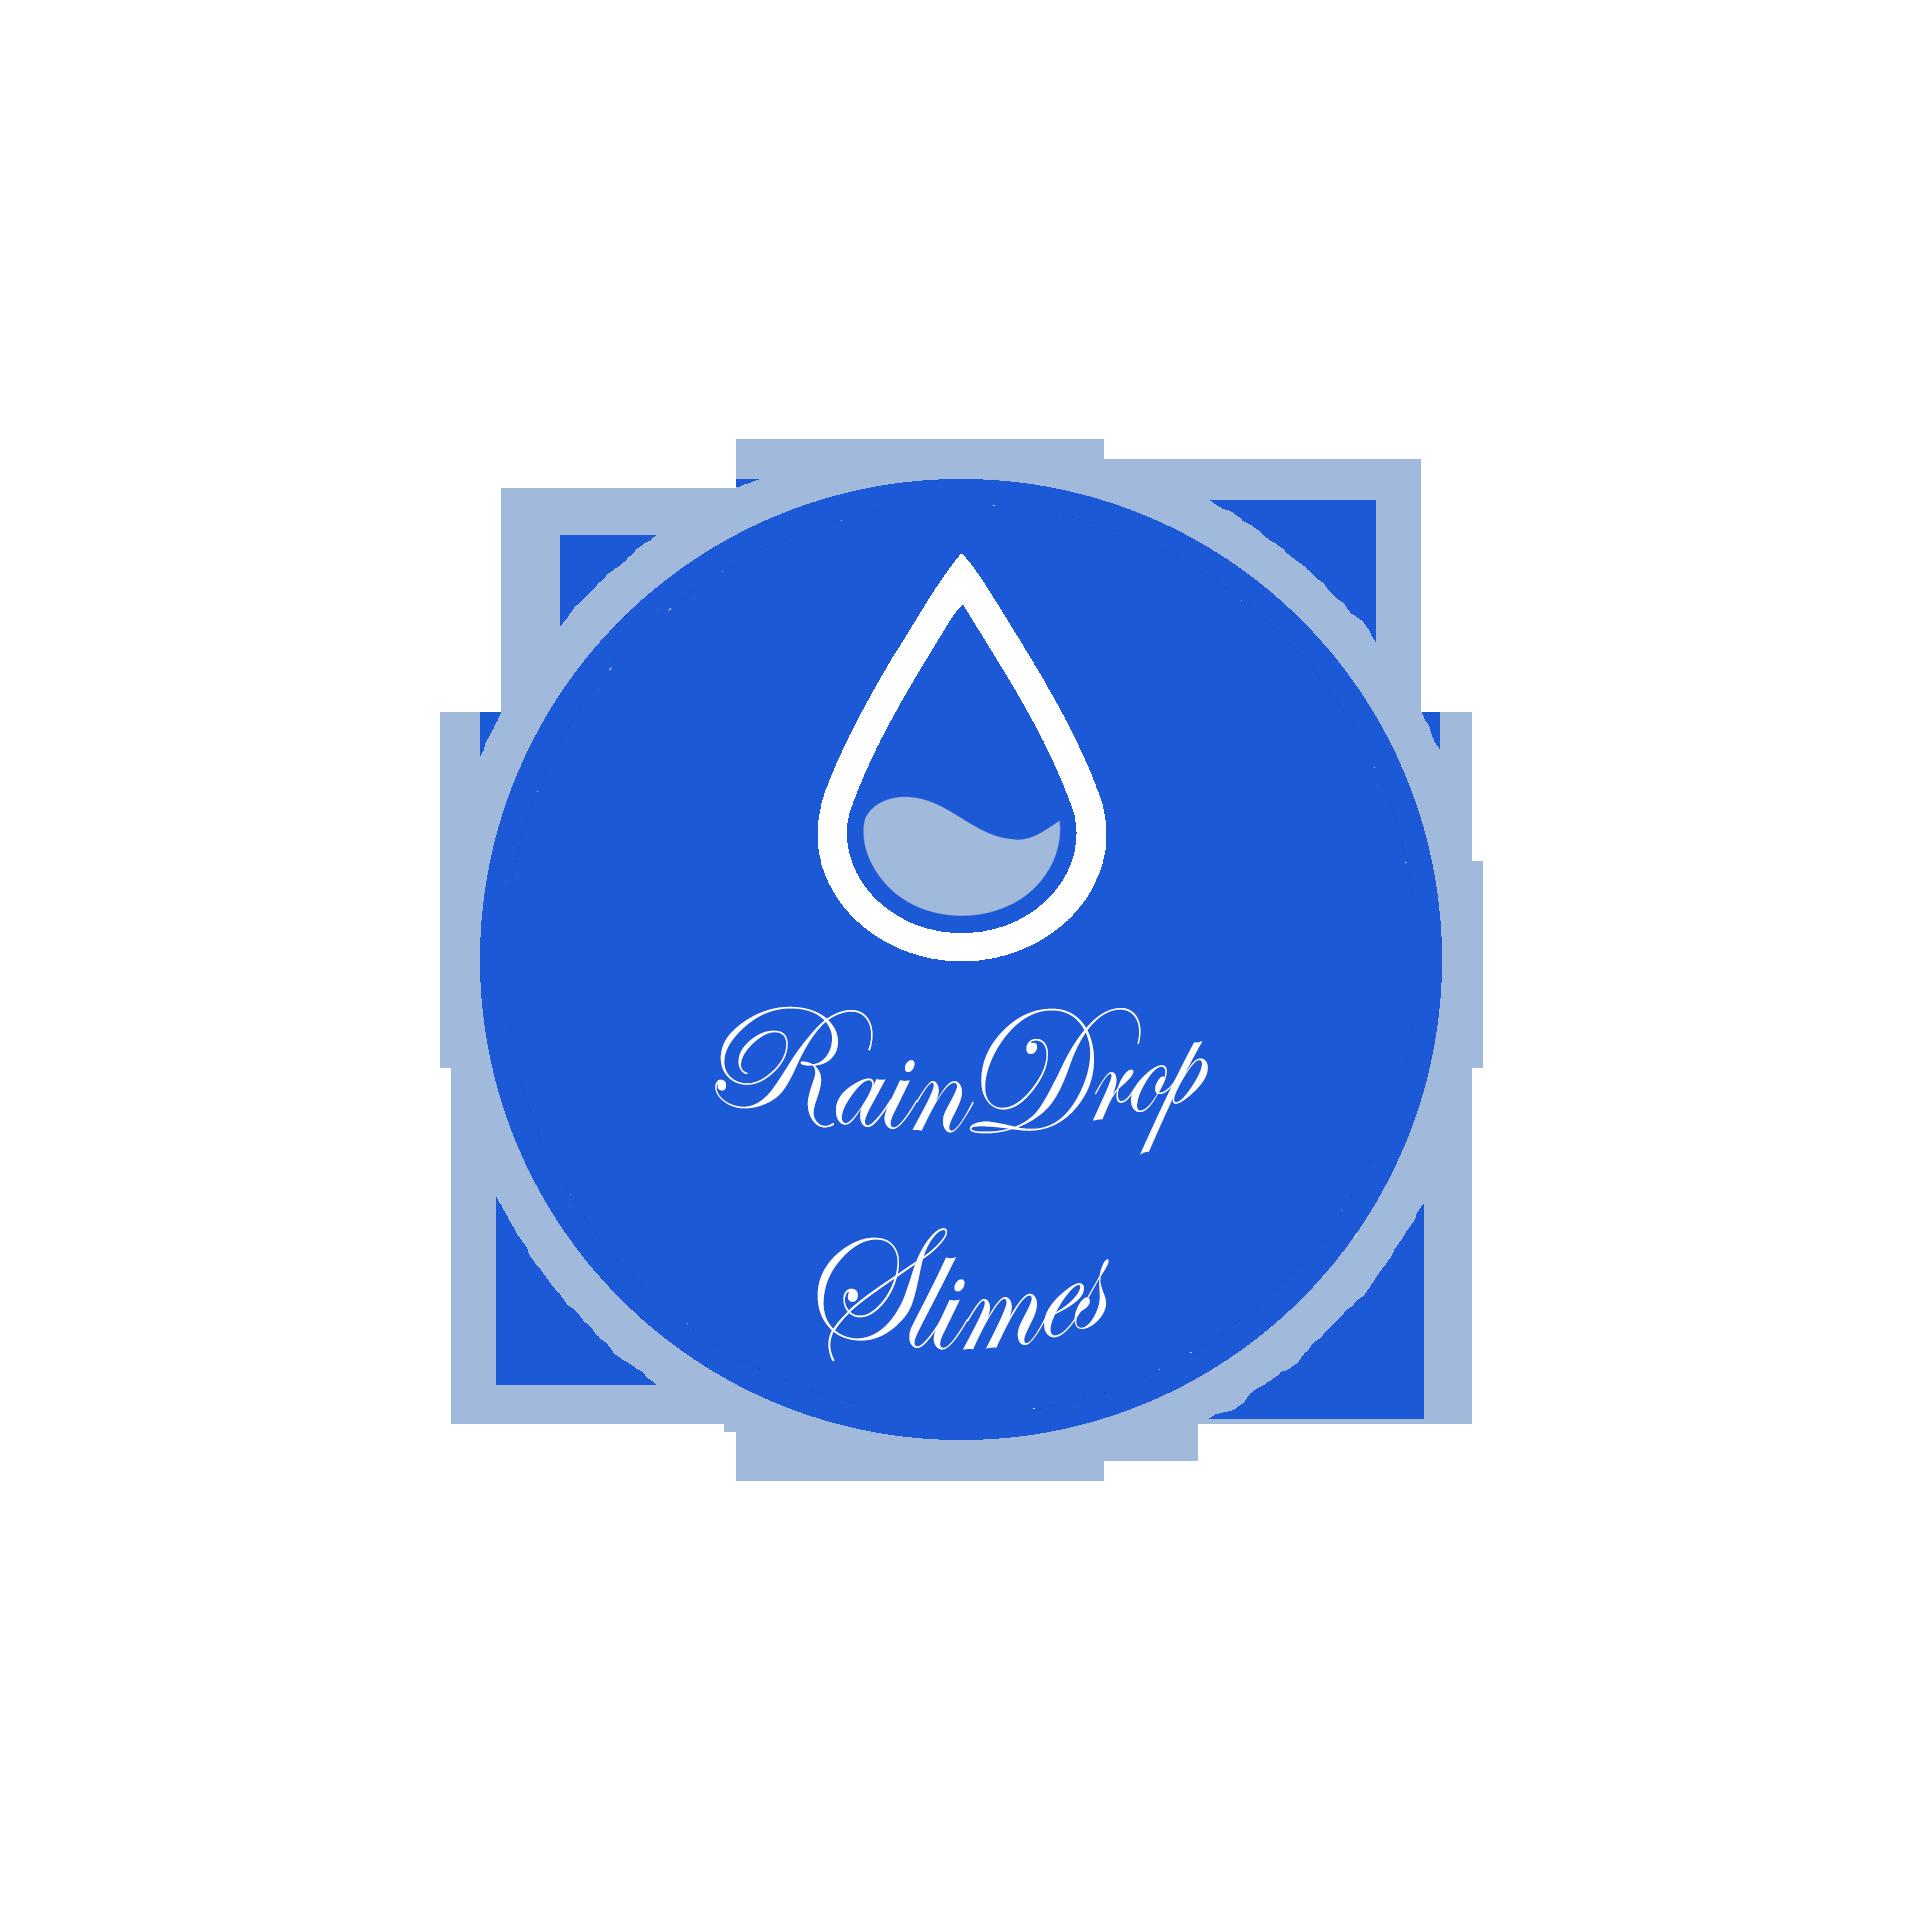 Raindrop slimes logo by smartoutlaw raindrop slimes logo by smartoutlaw